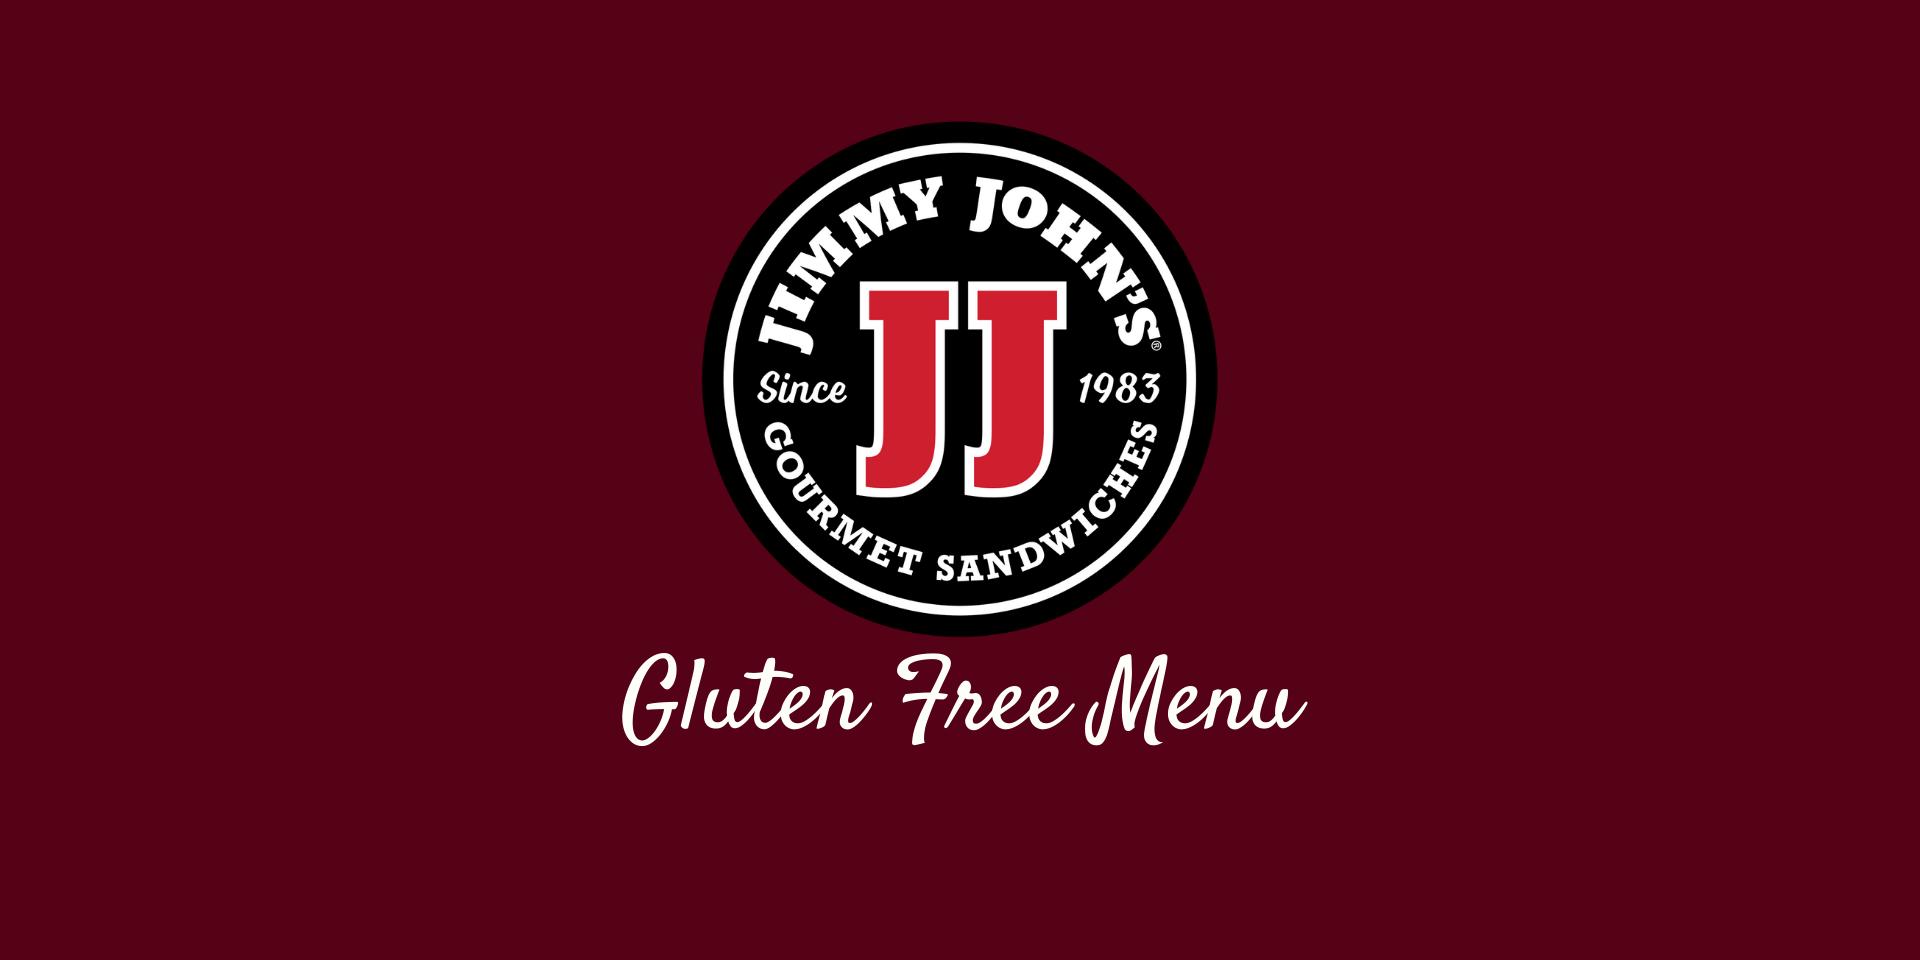 Jimmy John S Gluten Free Menu 2020 Gluten Free Menu Gluten Free Restaurants Gluten Free